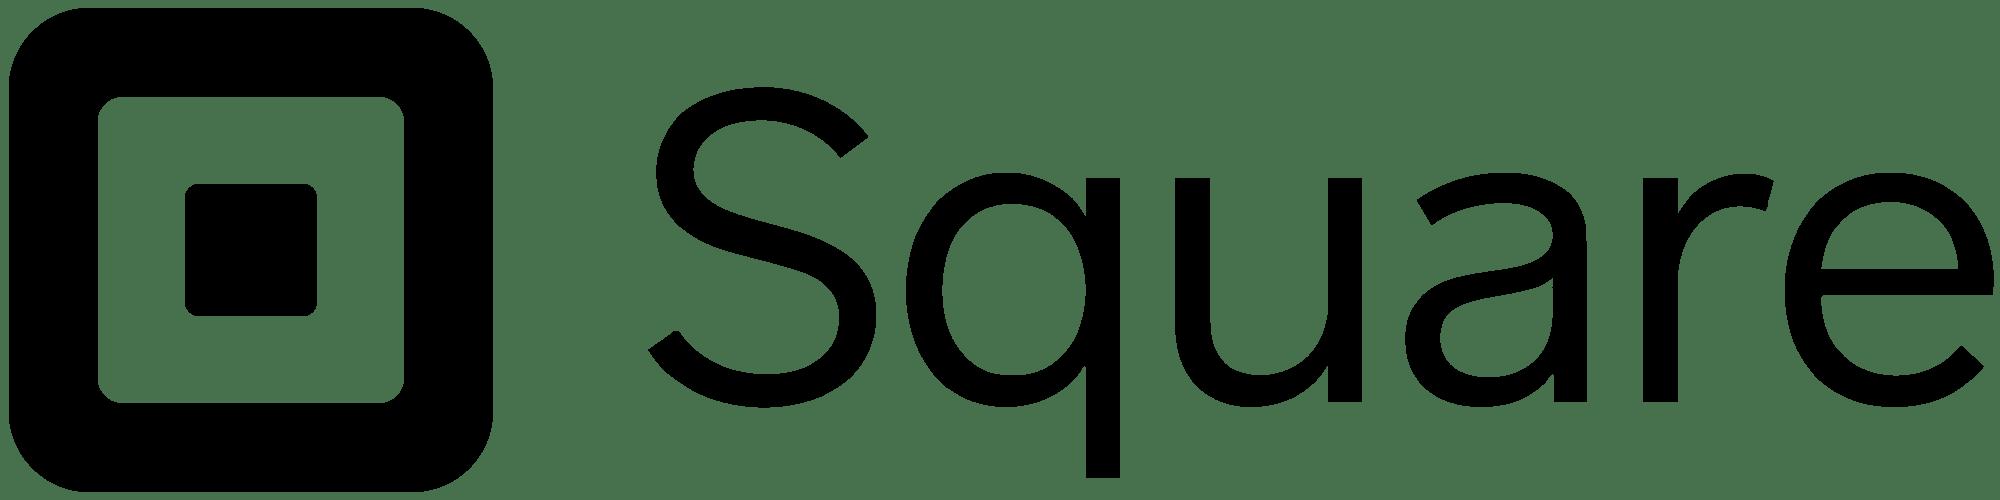 Square E-commerce logo